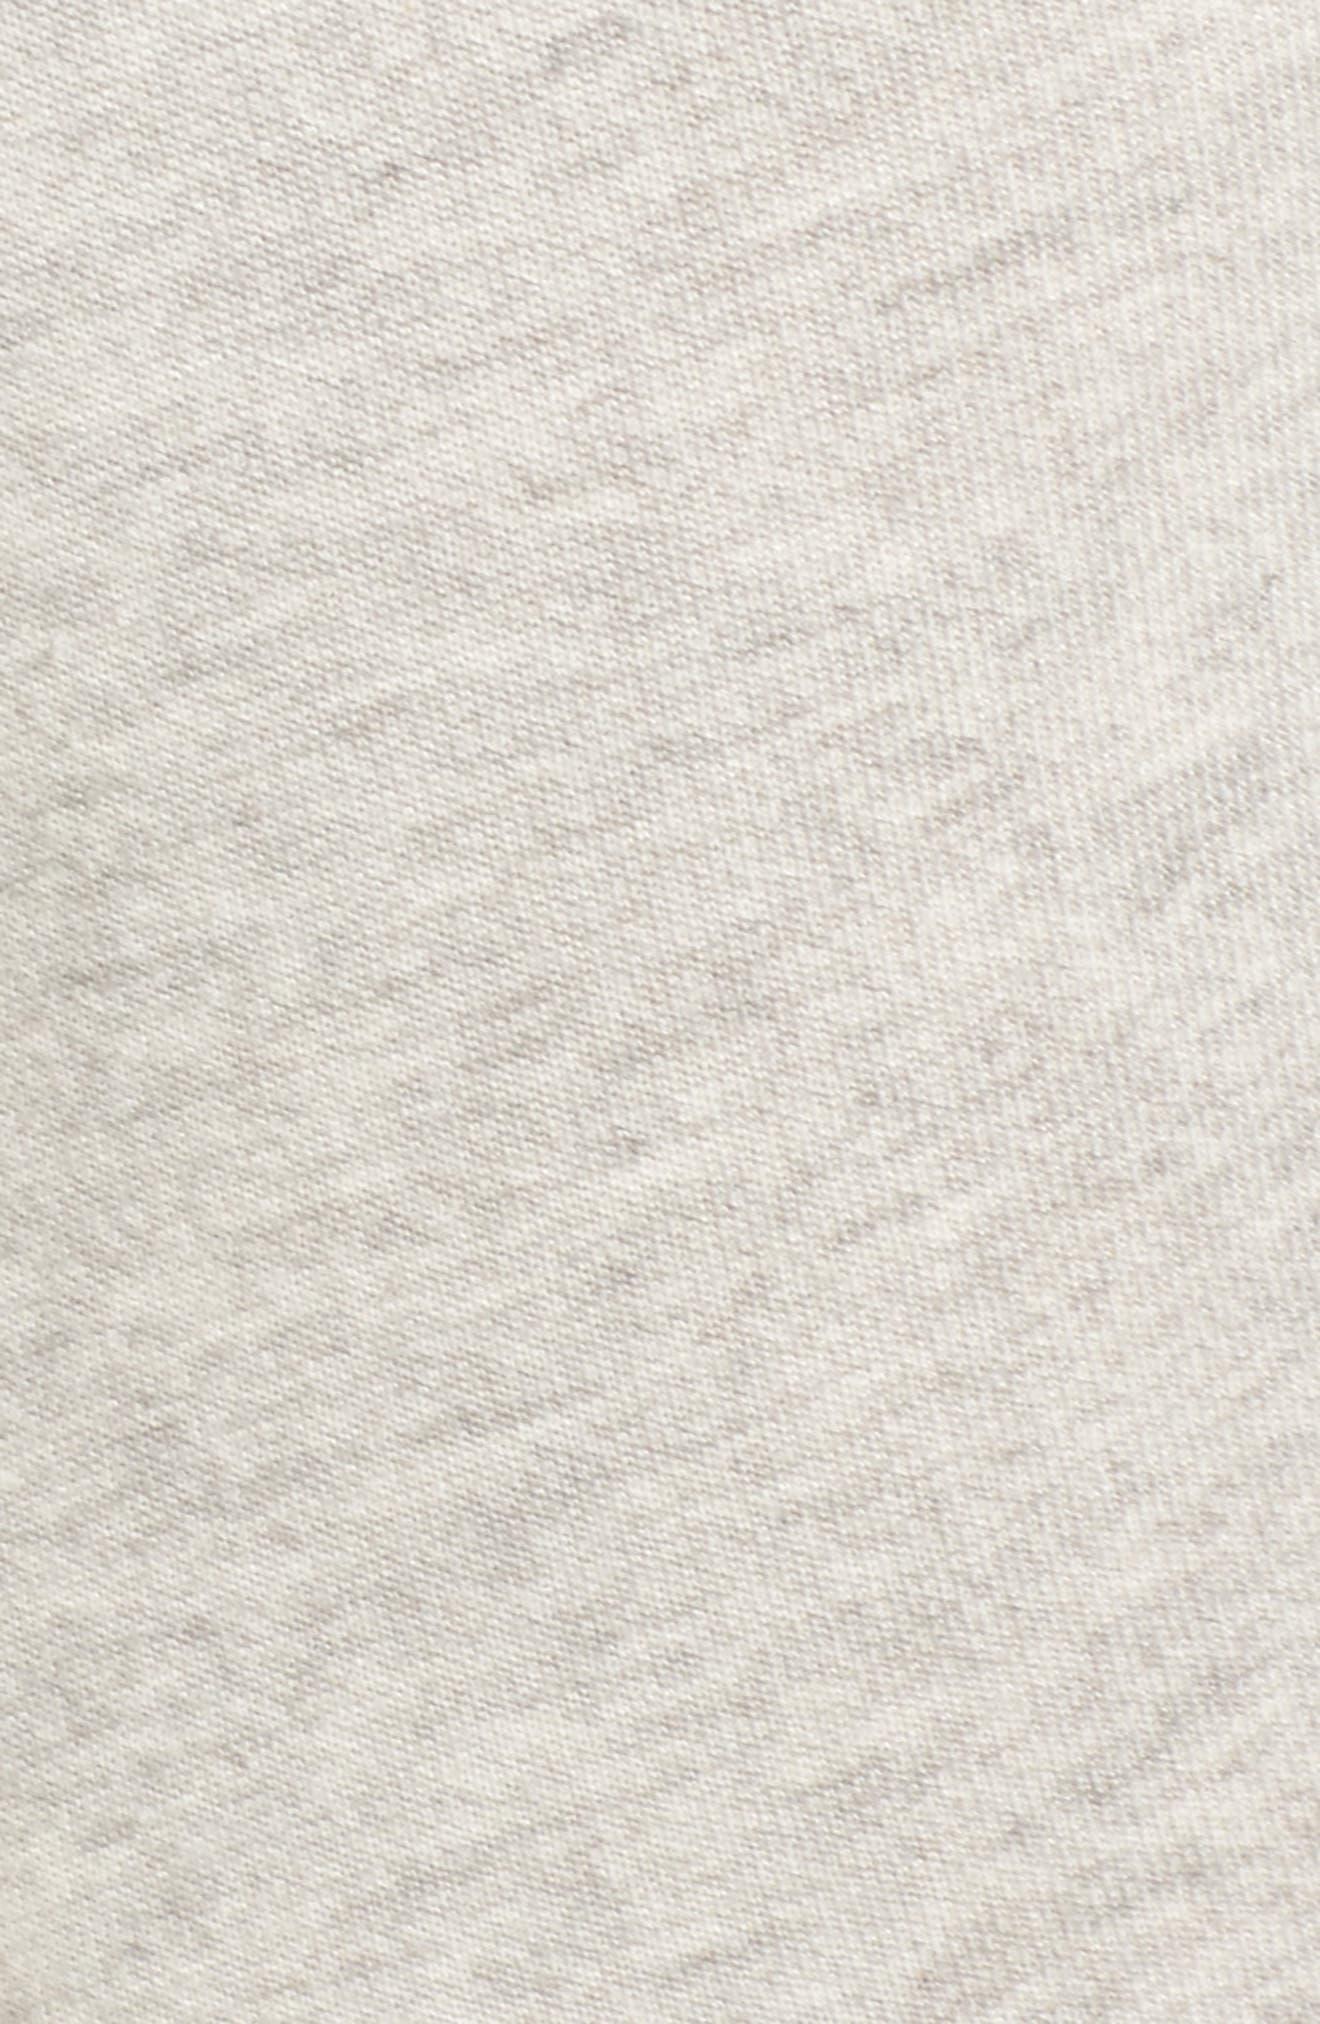 Malibu Slit Knee Sweatpants,                             Alternate thumbnail 5, color,                             030